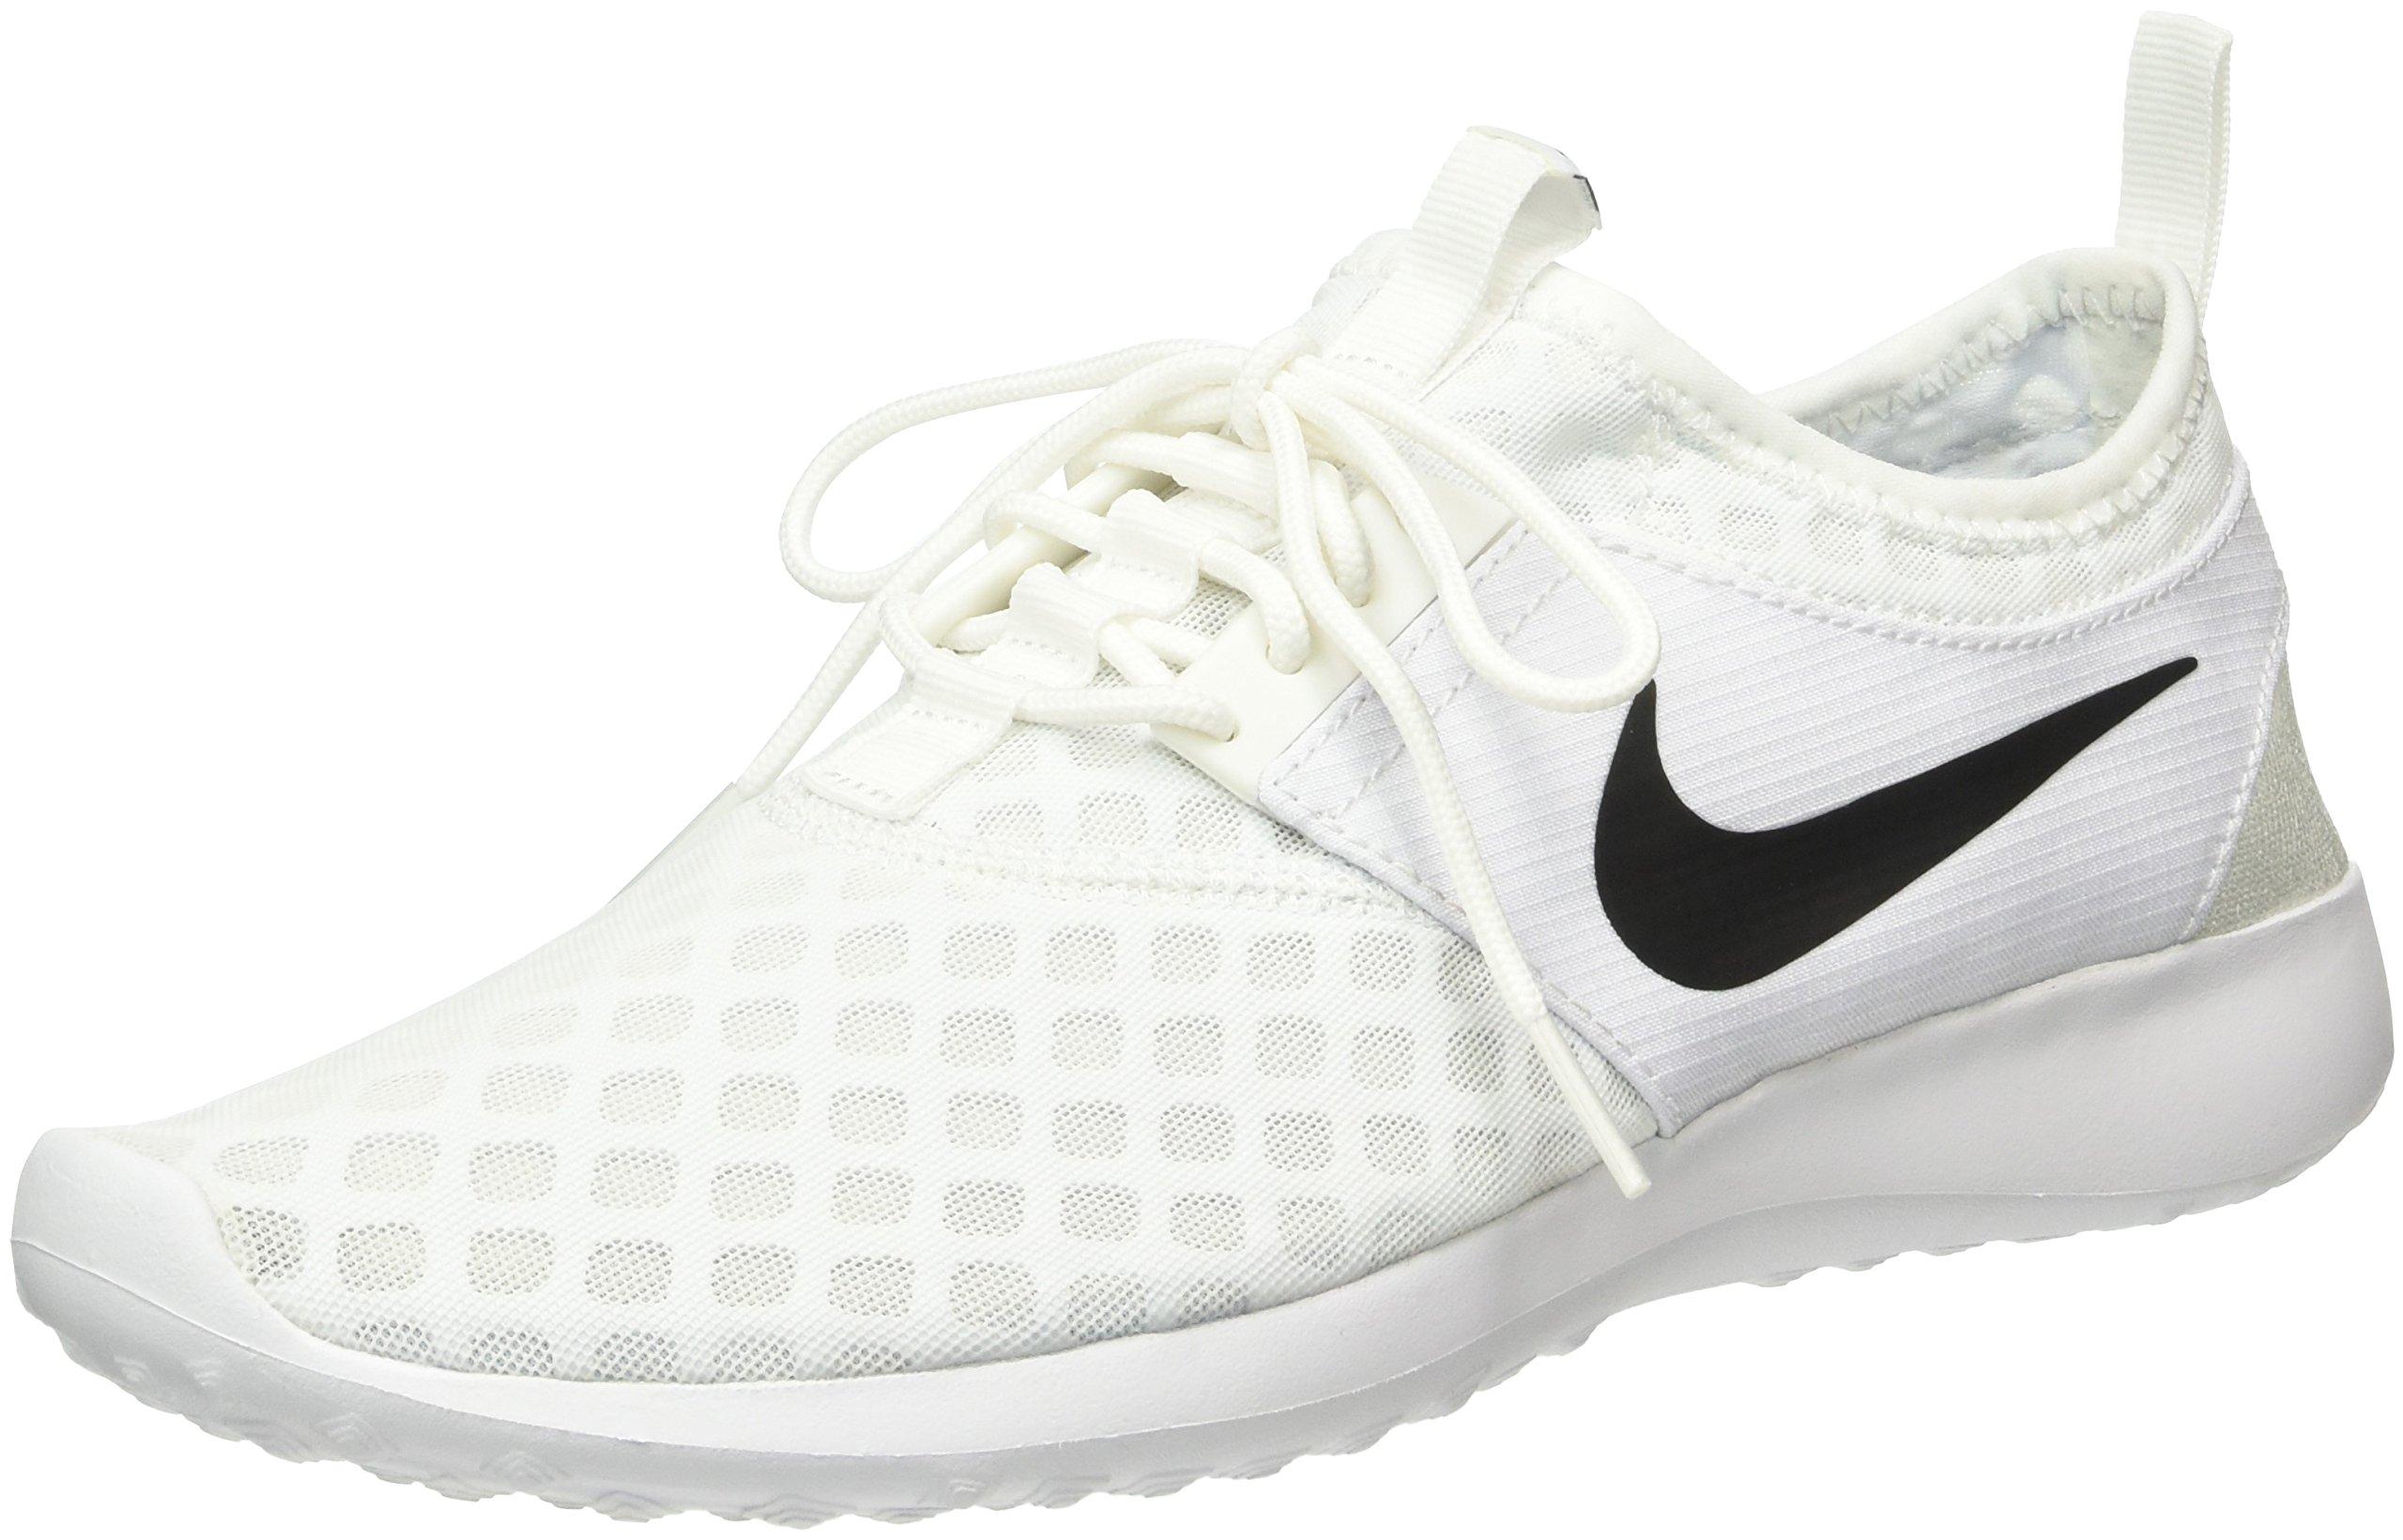 Nike Women's Juvenate Sneaker, White/Black, 5.5 B US